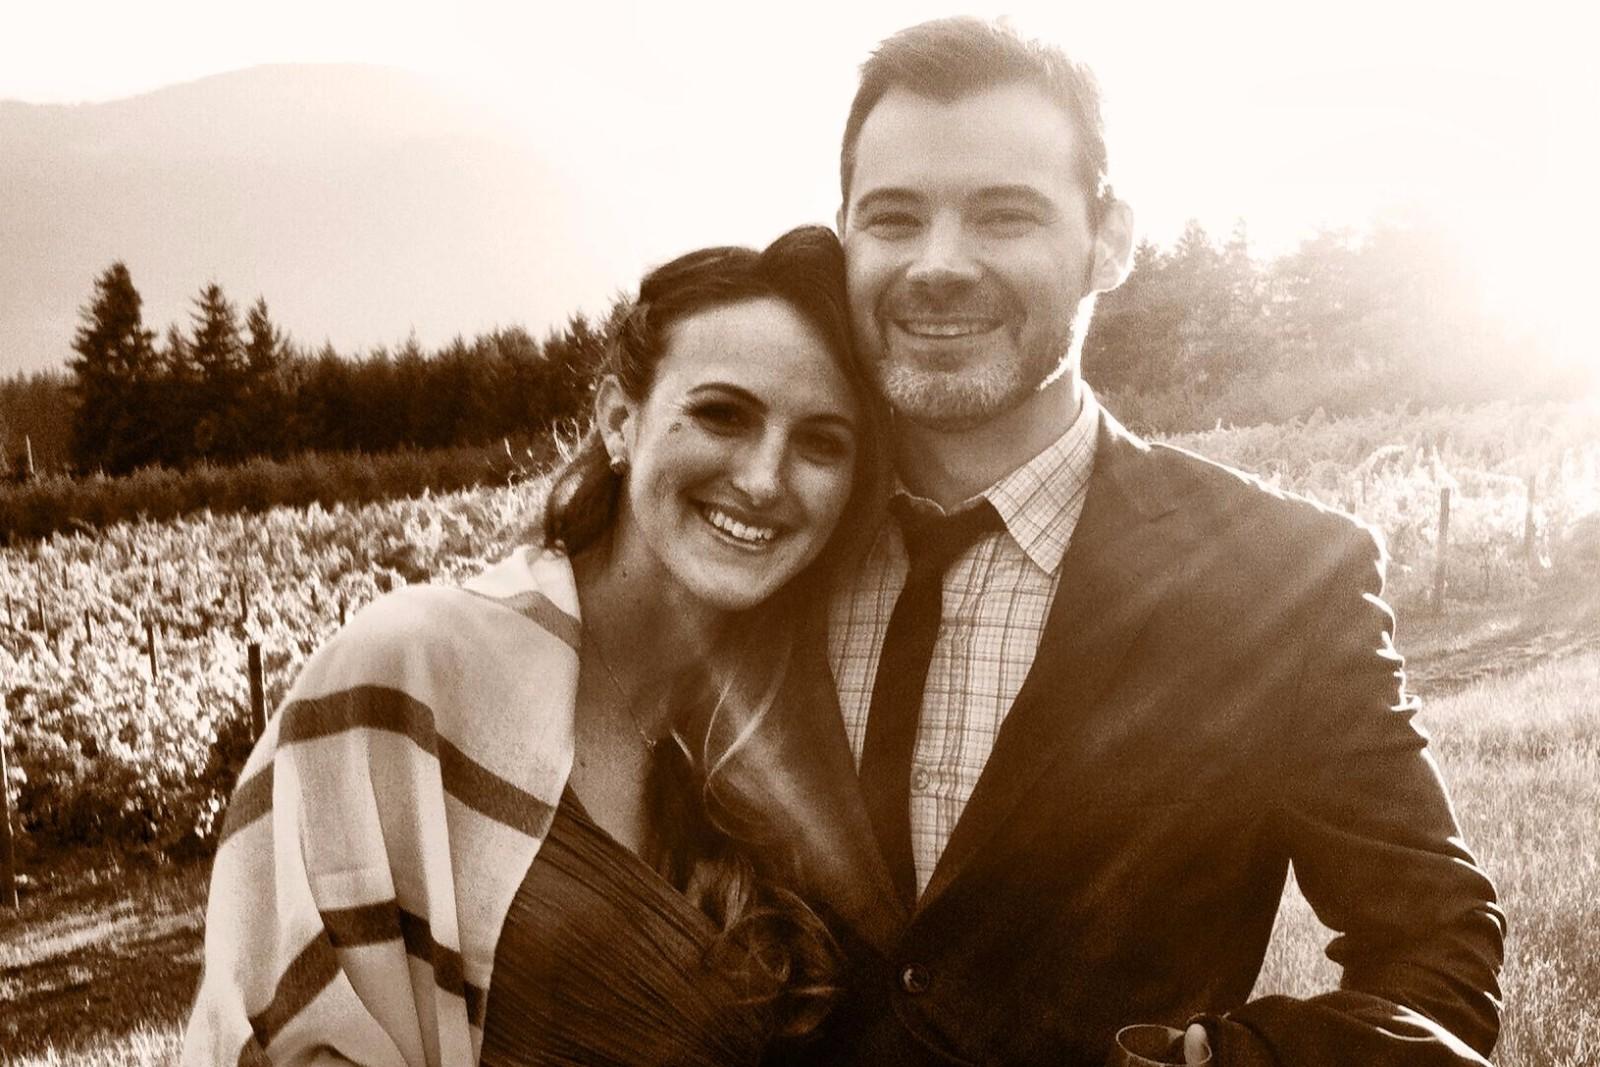 Alison and Chris